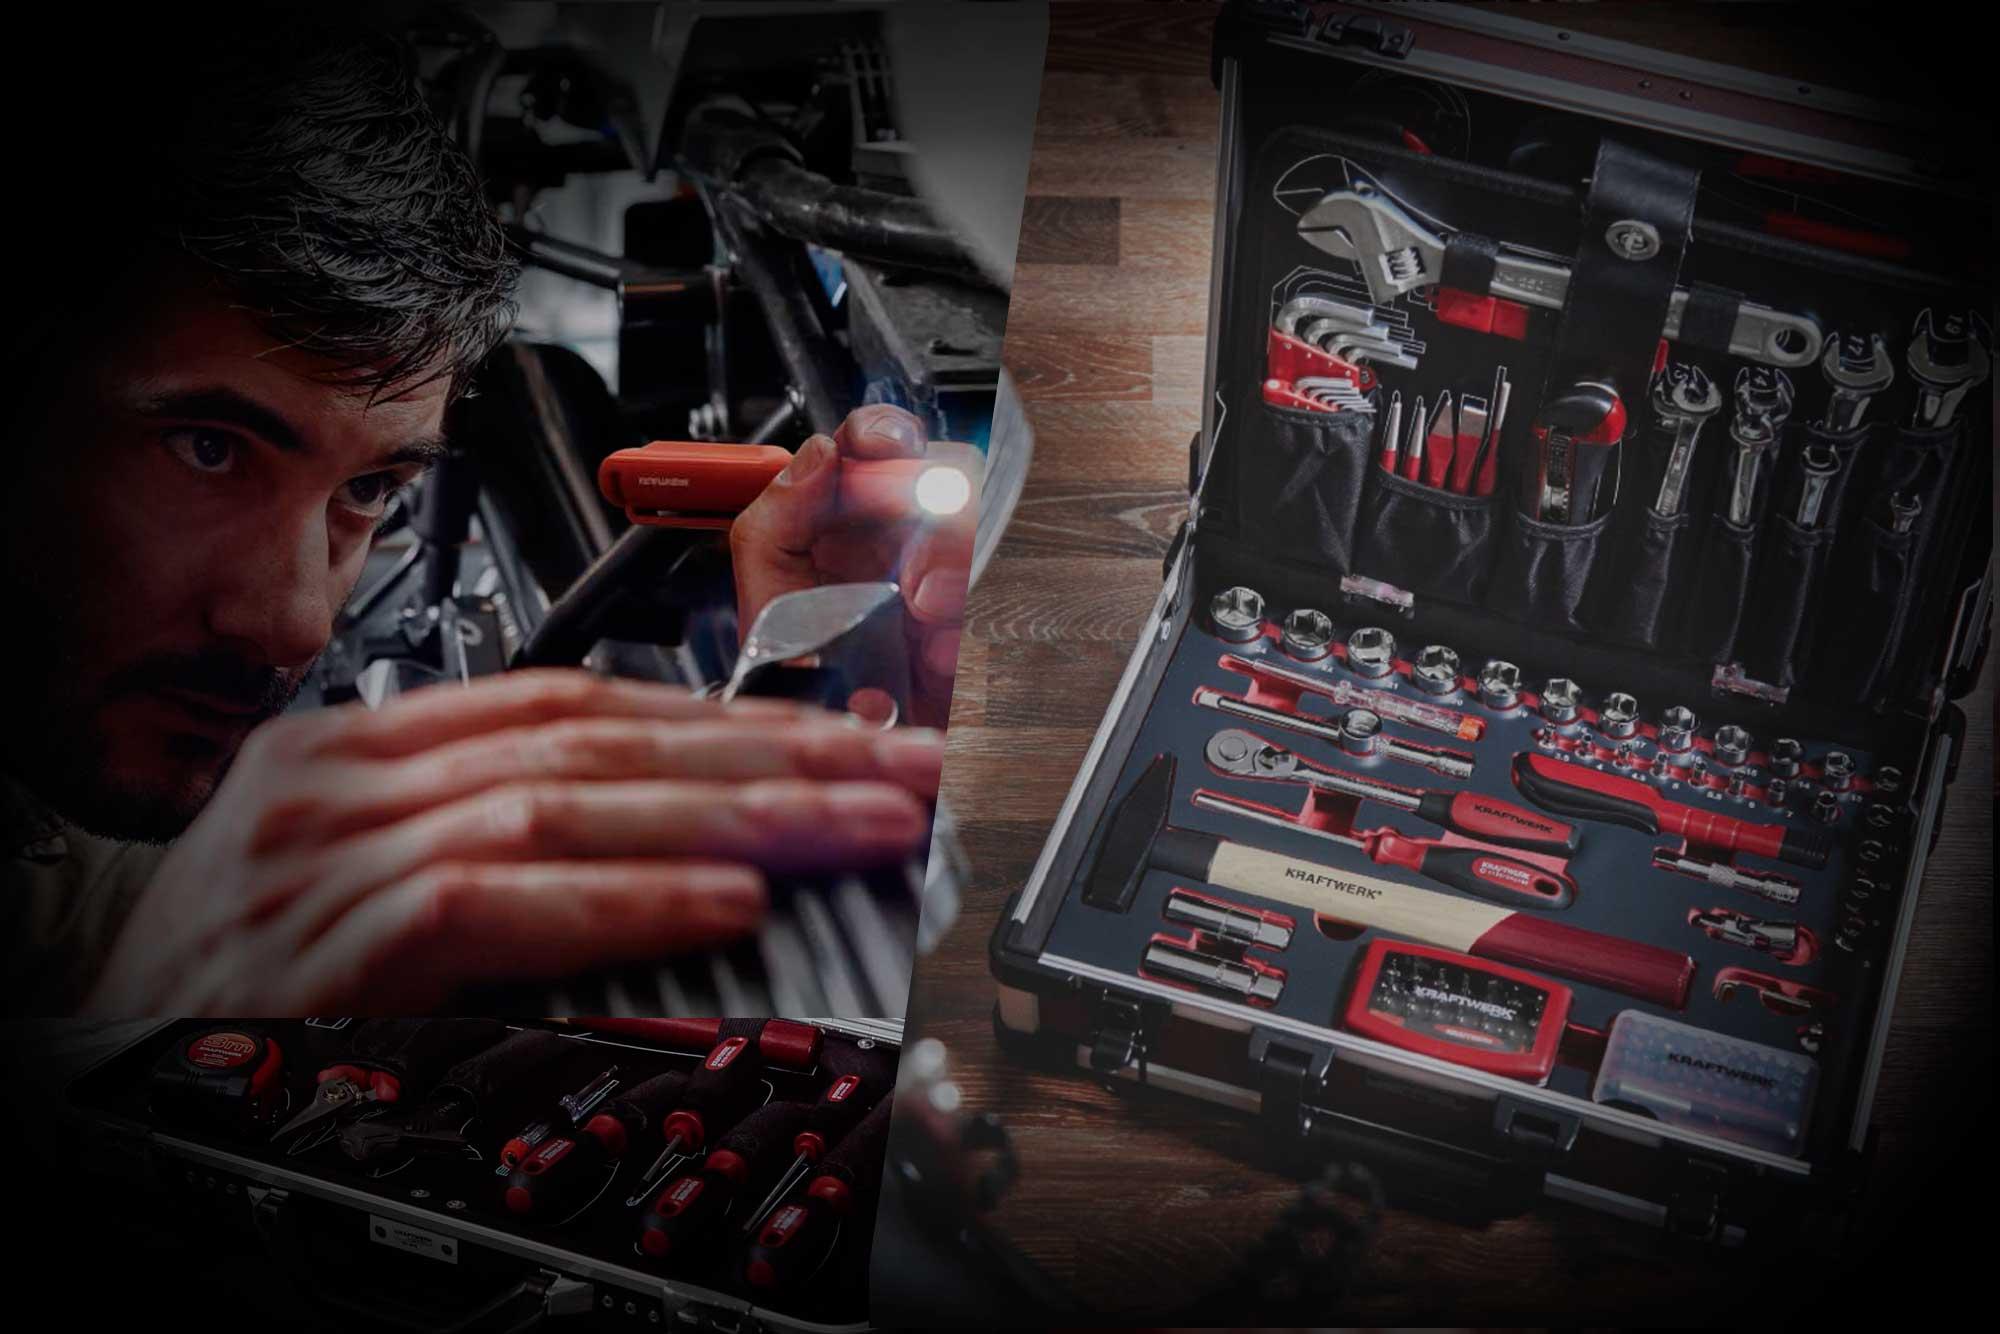 bg tienda better herramientas tools4us_02